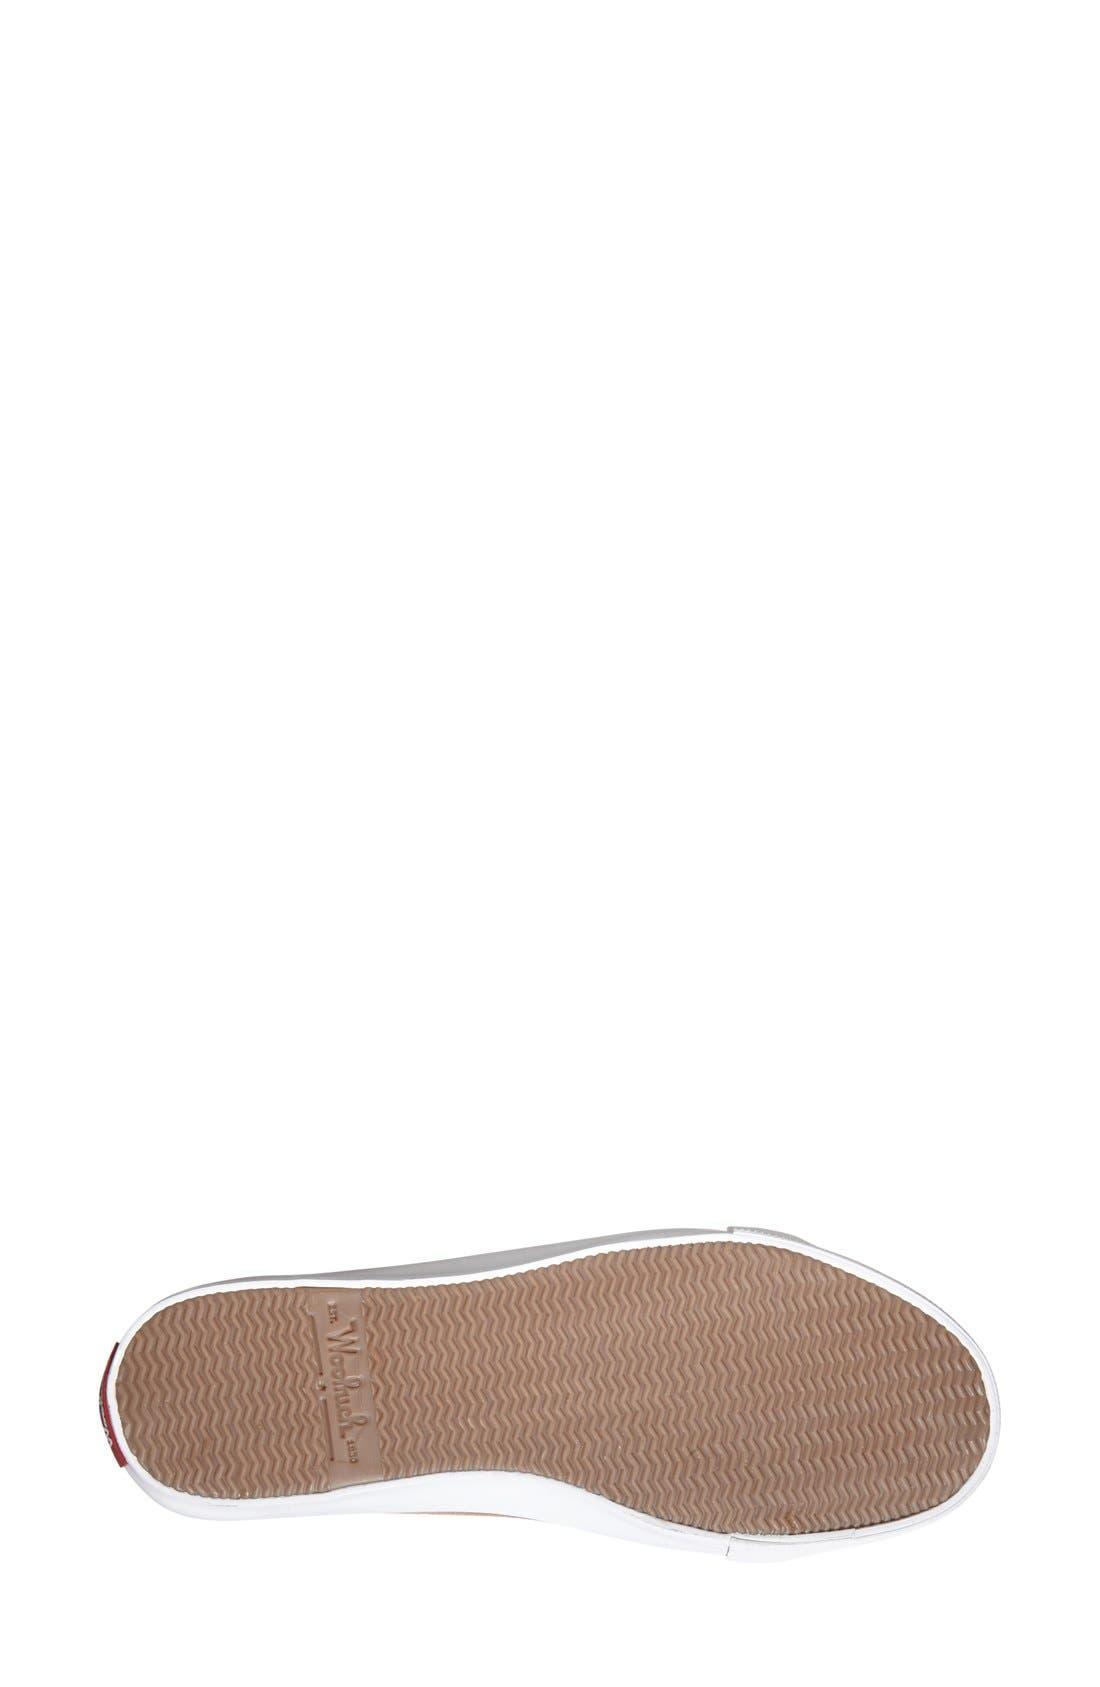 'Strand' Sneaker,                             Alternate thumbnail 4, color,                             Brush Brown Canvas